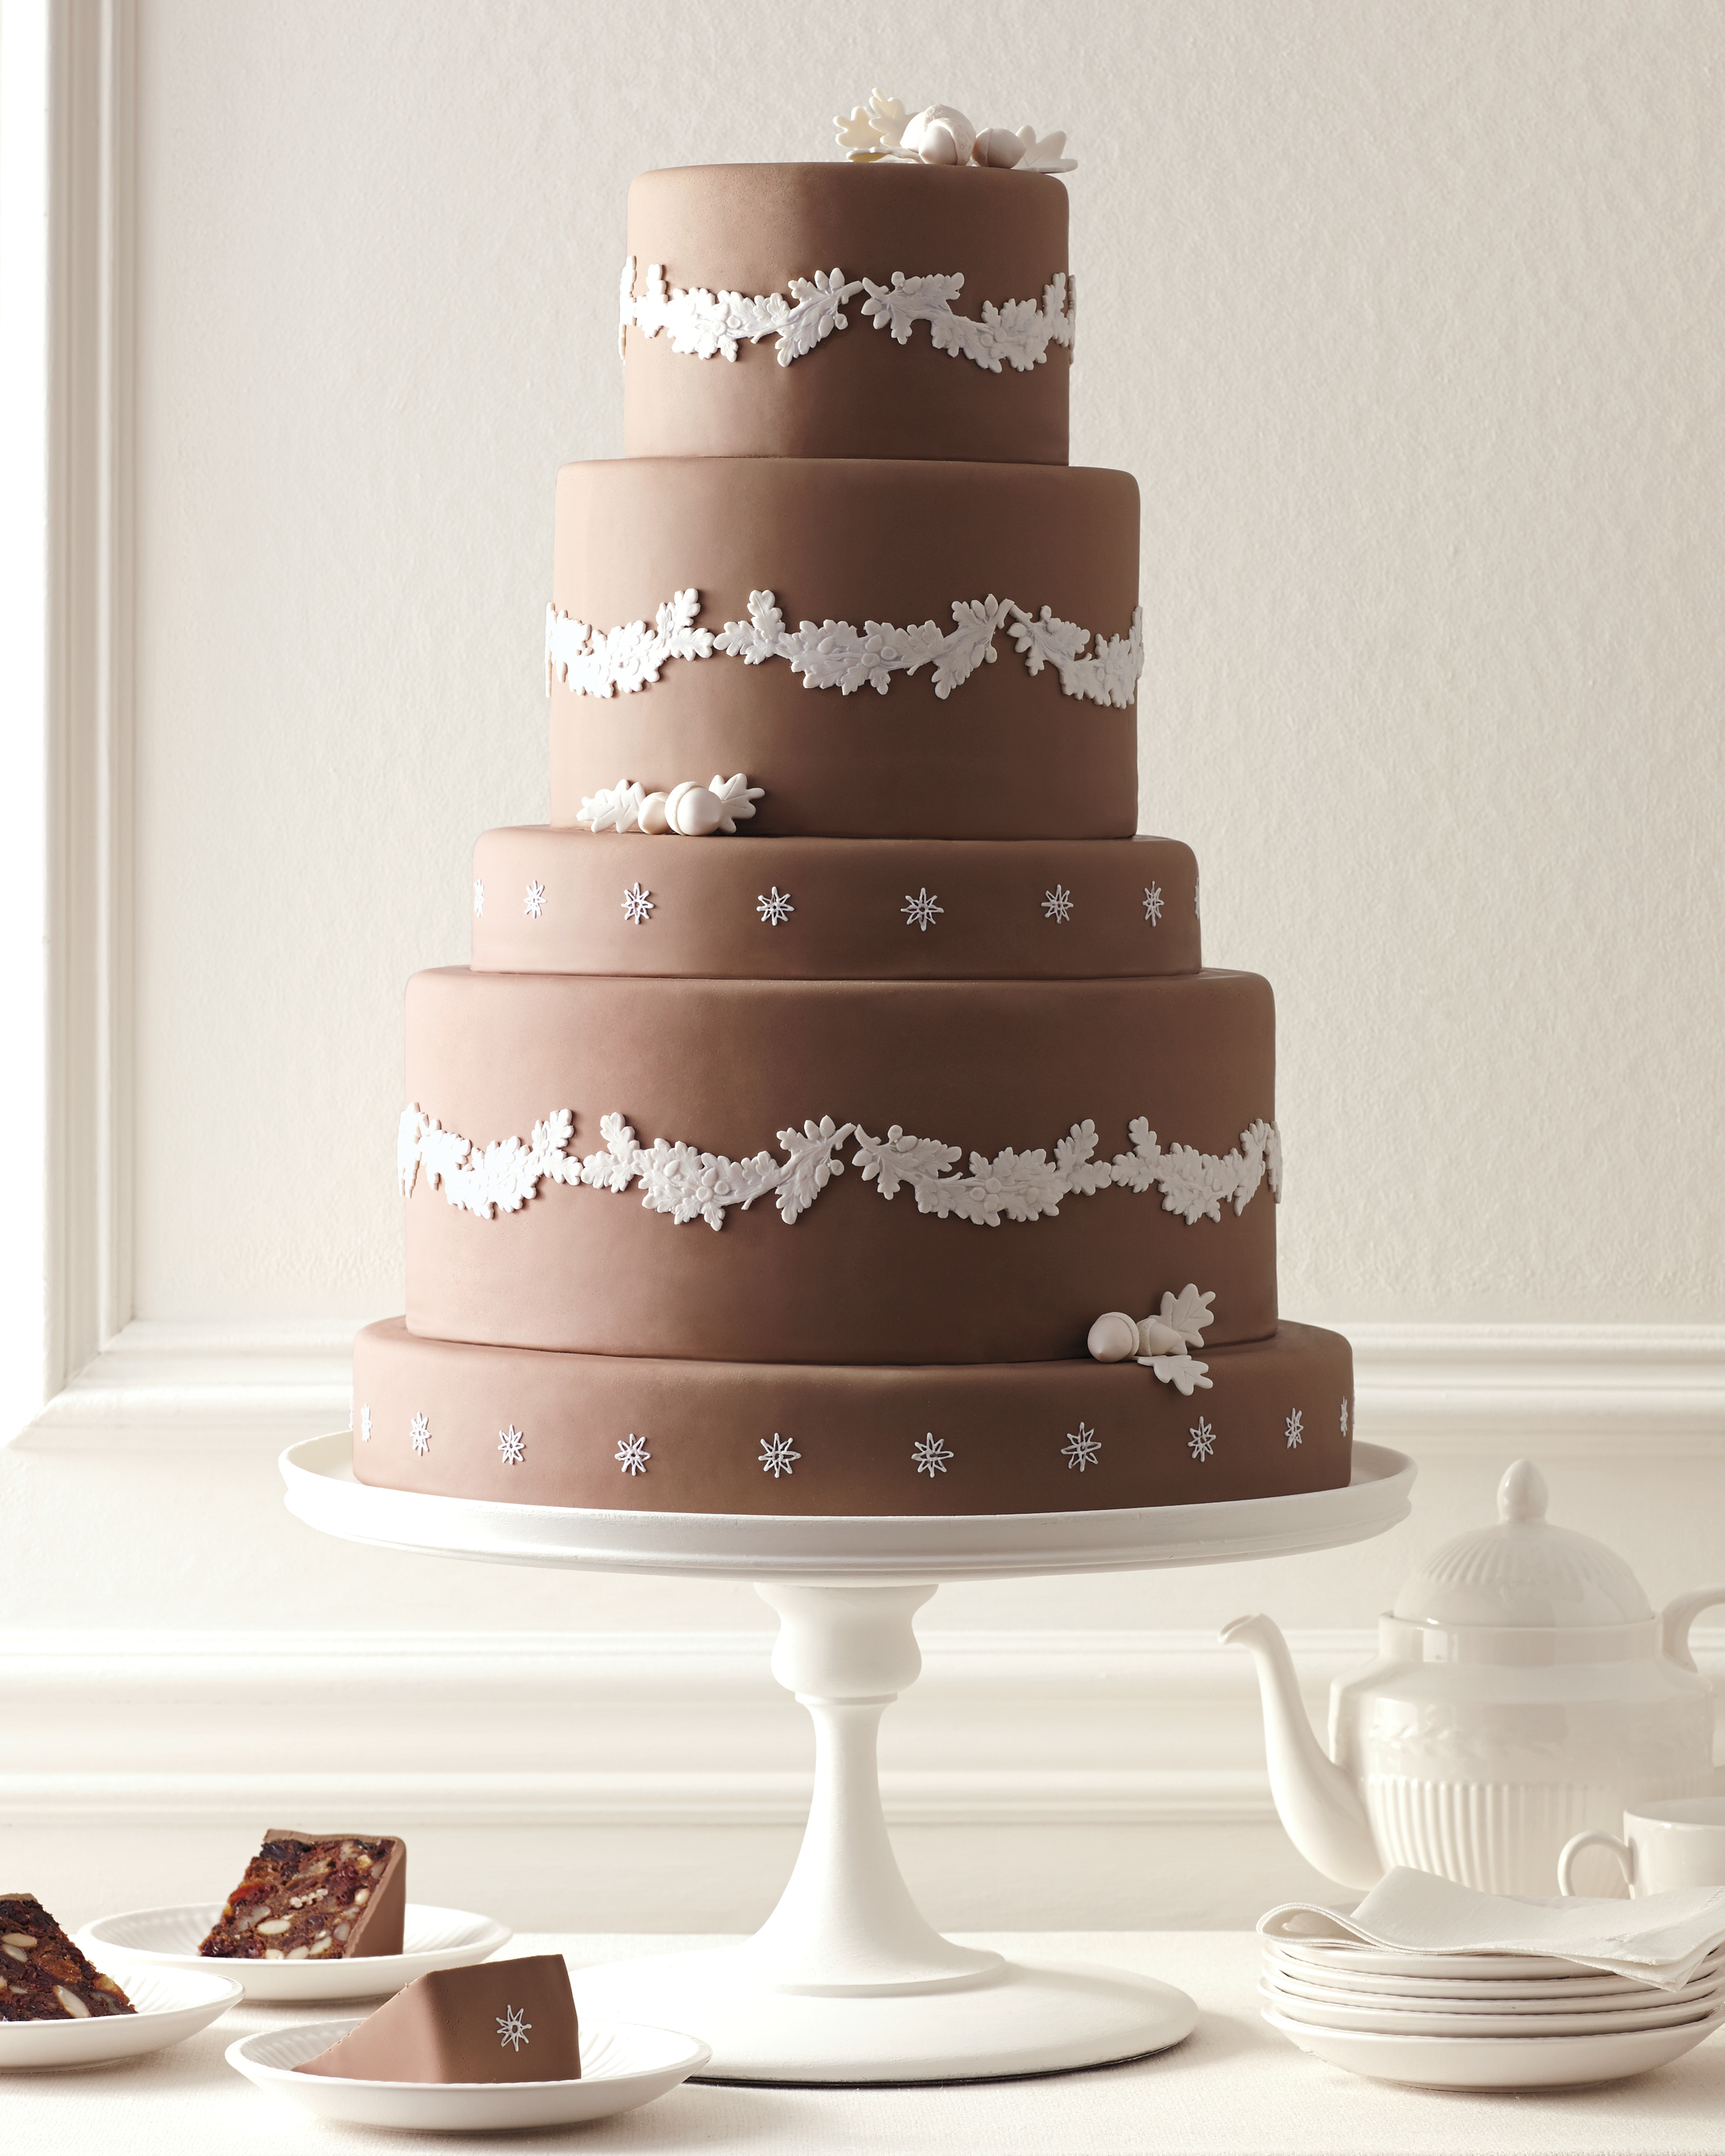 fruit-cake-029-mwd110426.jpg